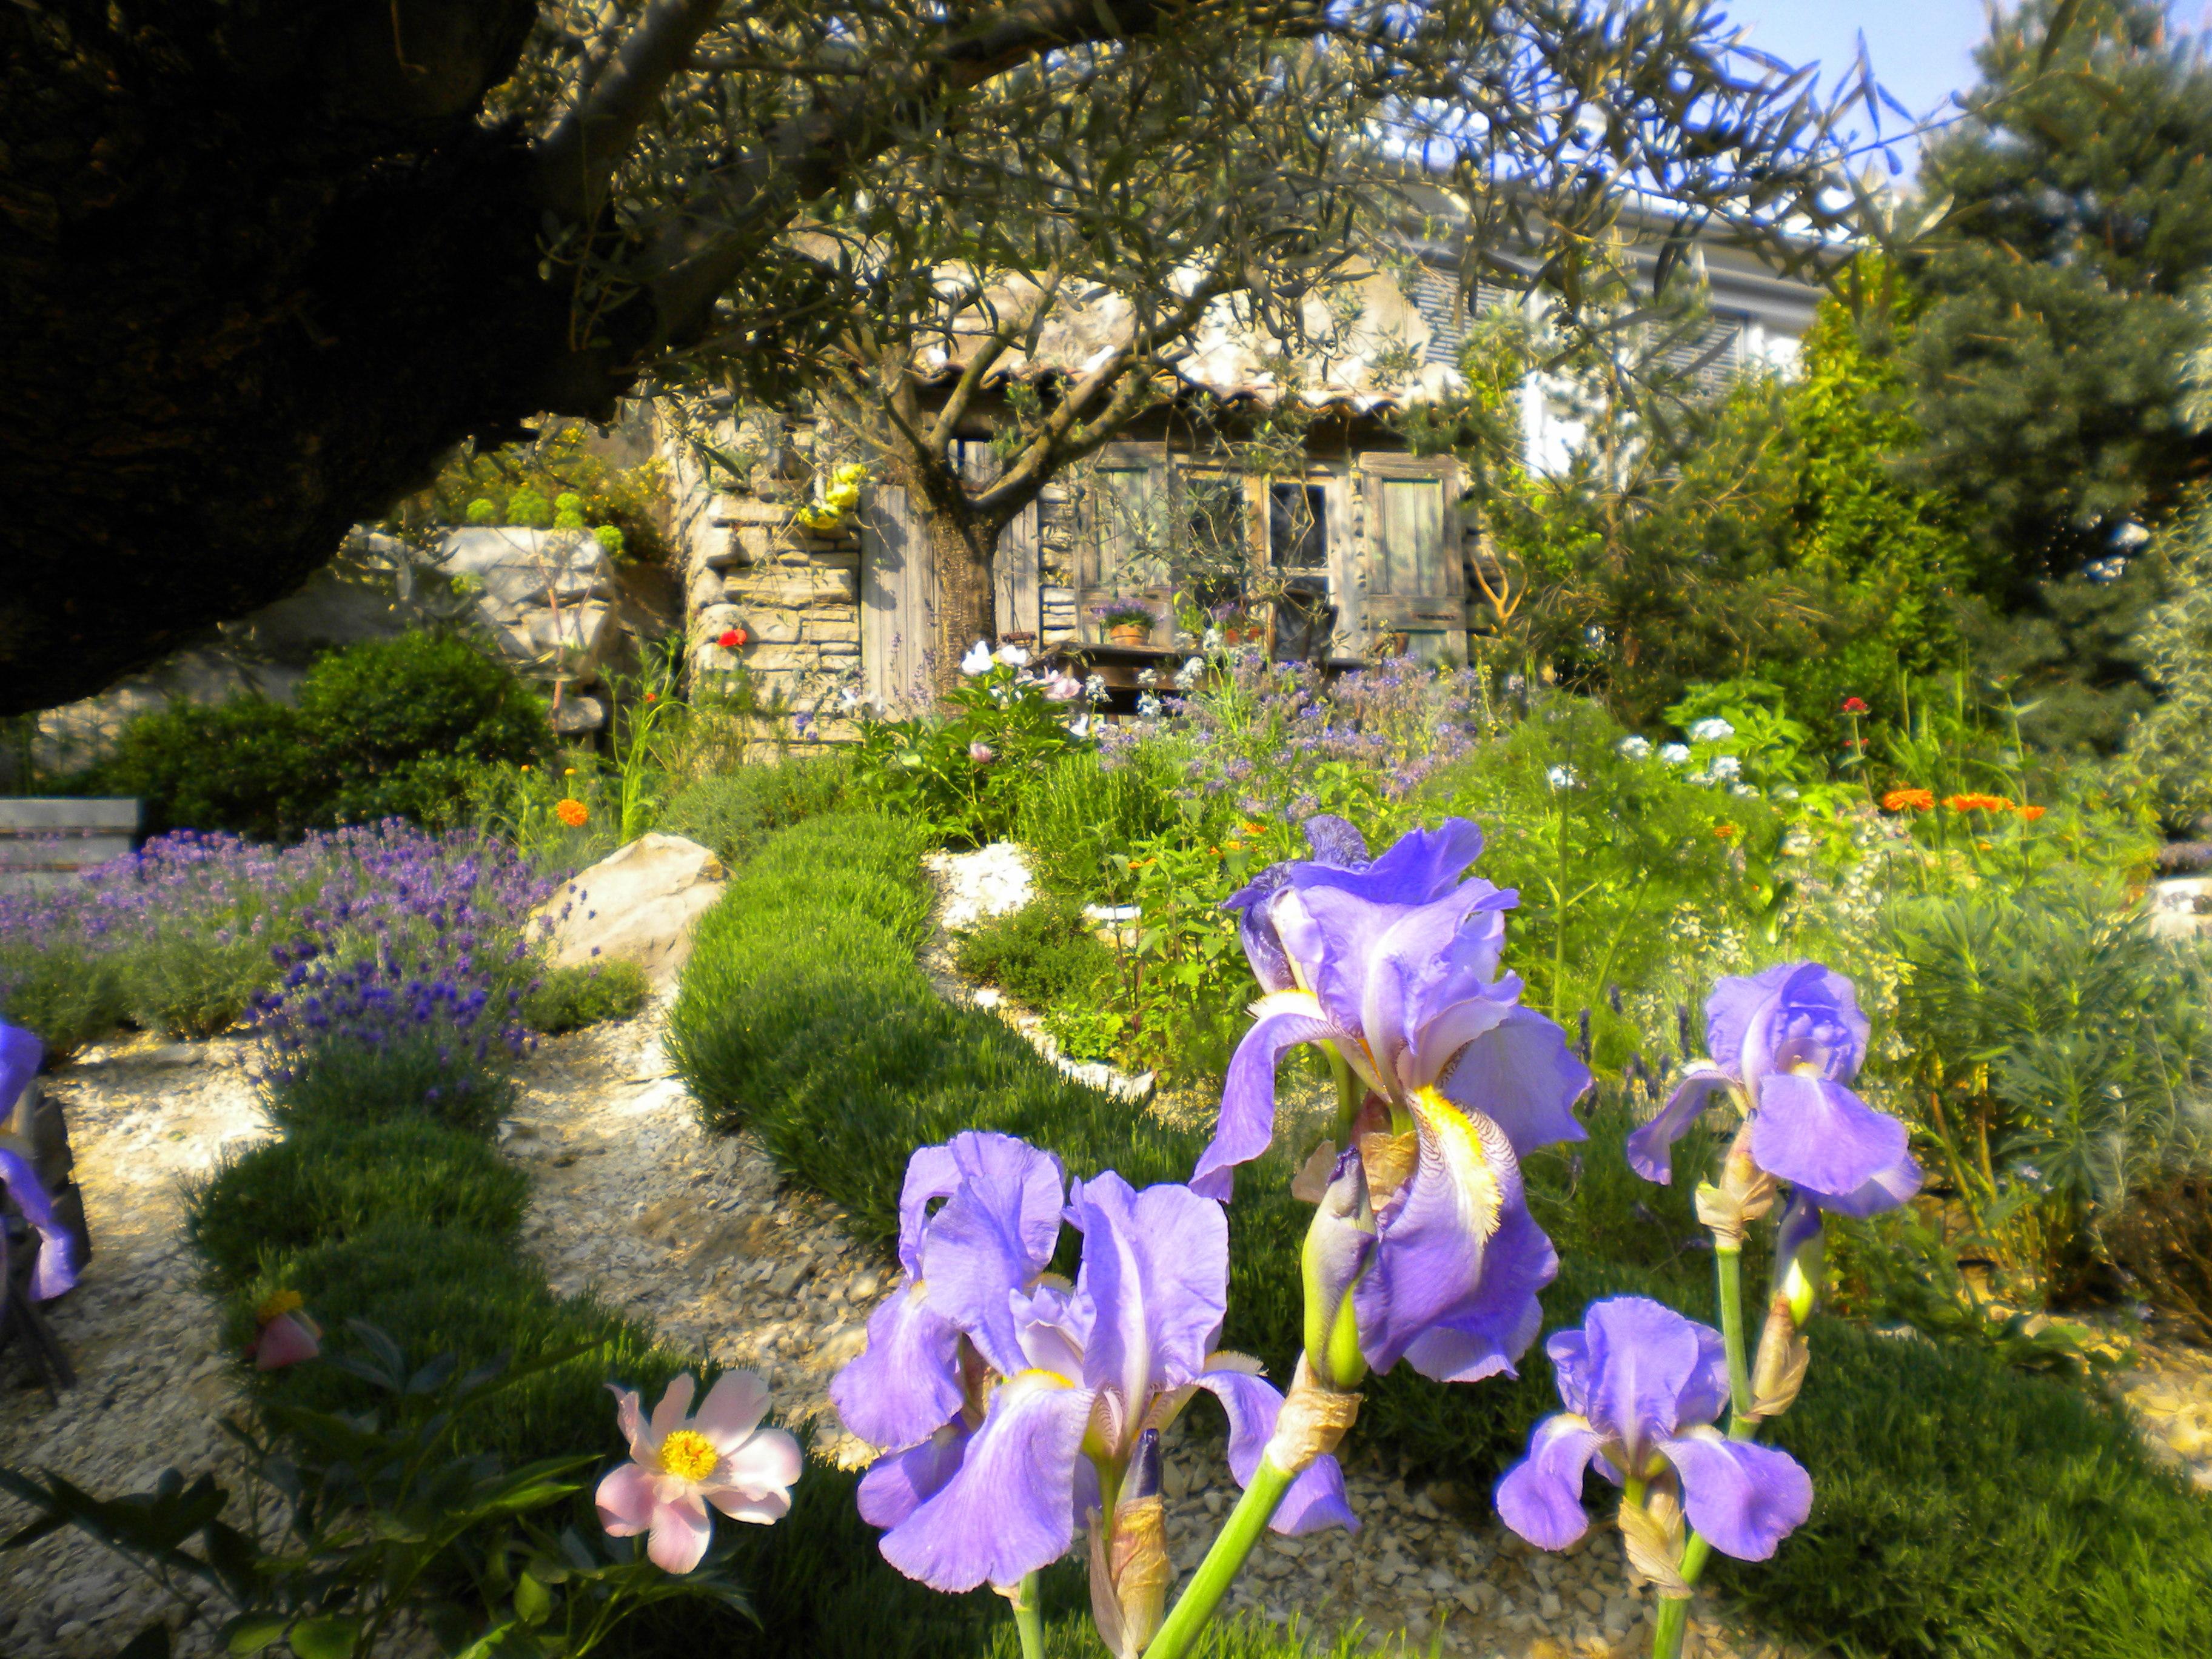 Le jardin francais le paysagiste Le jardin francais